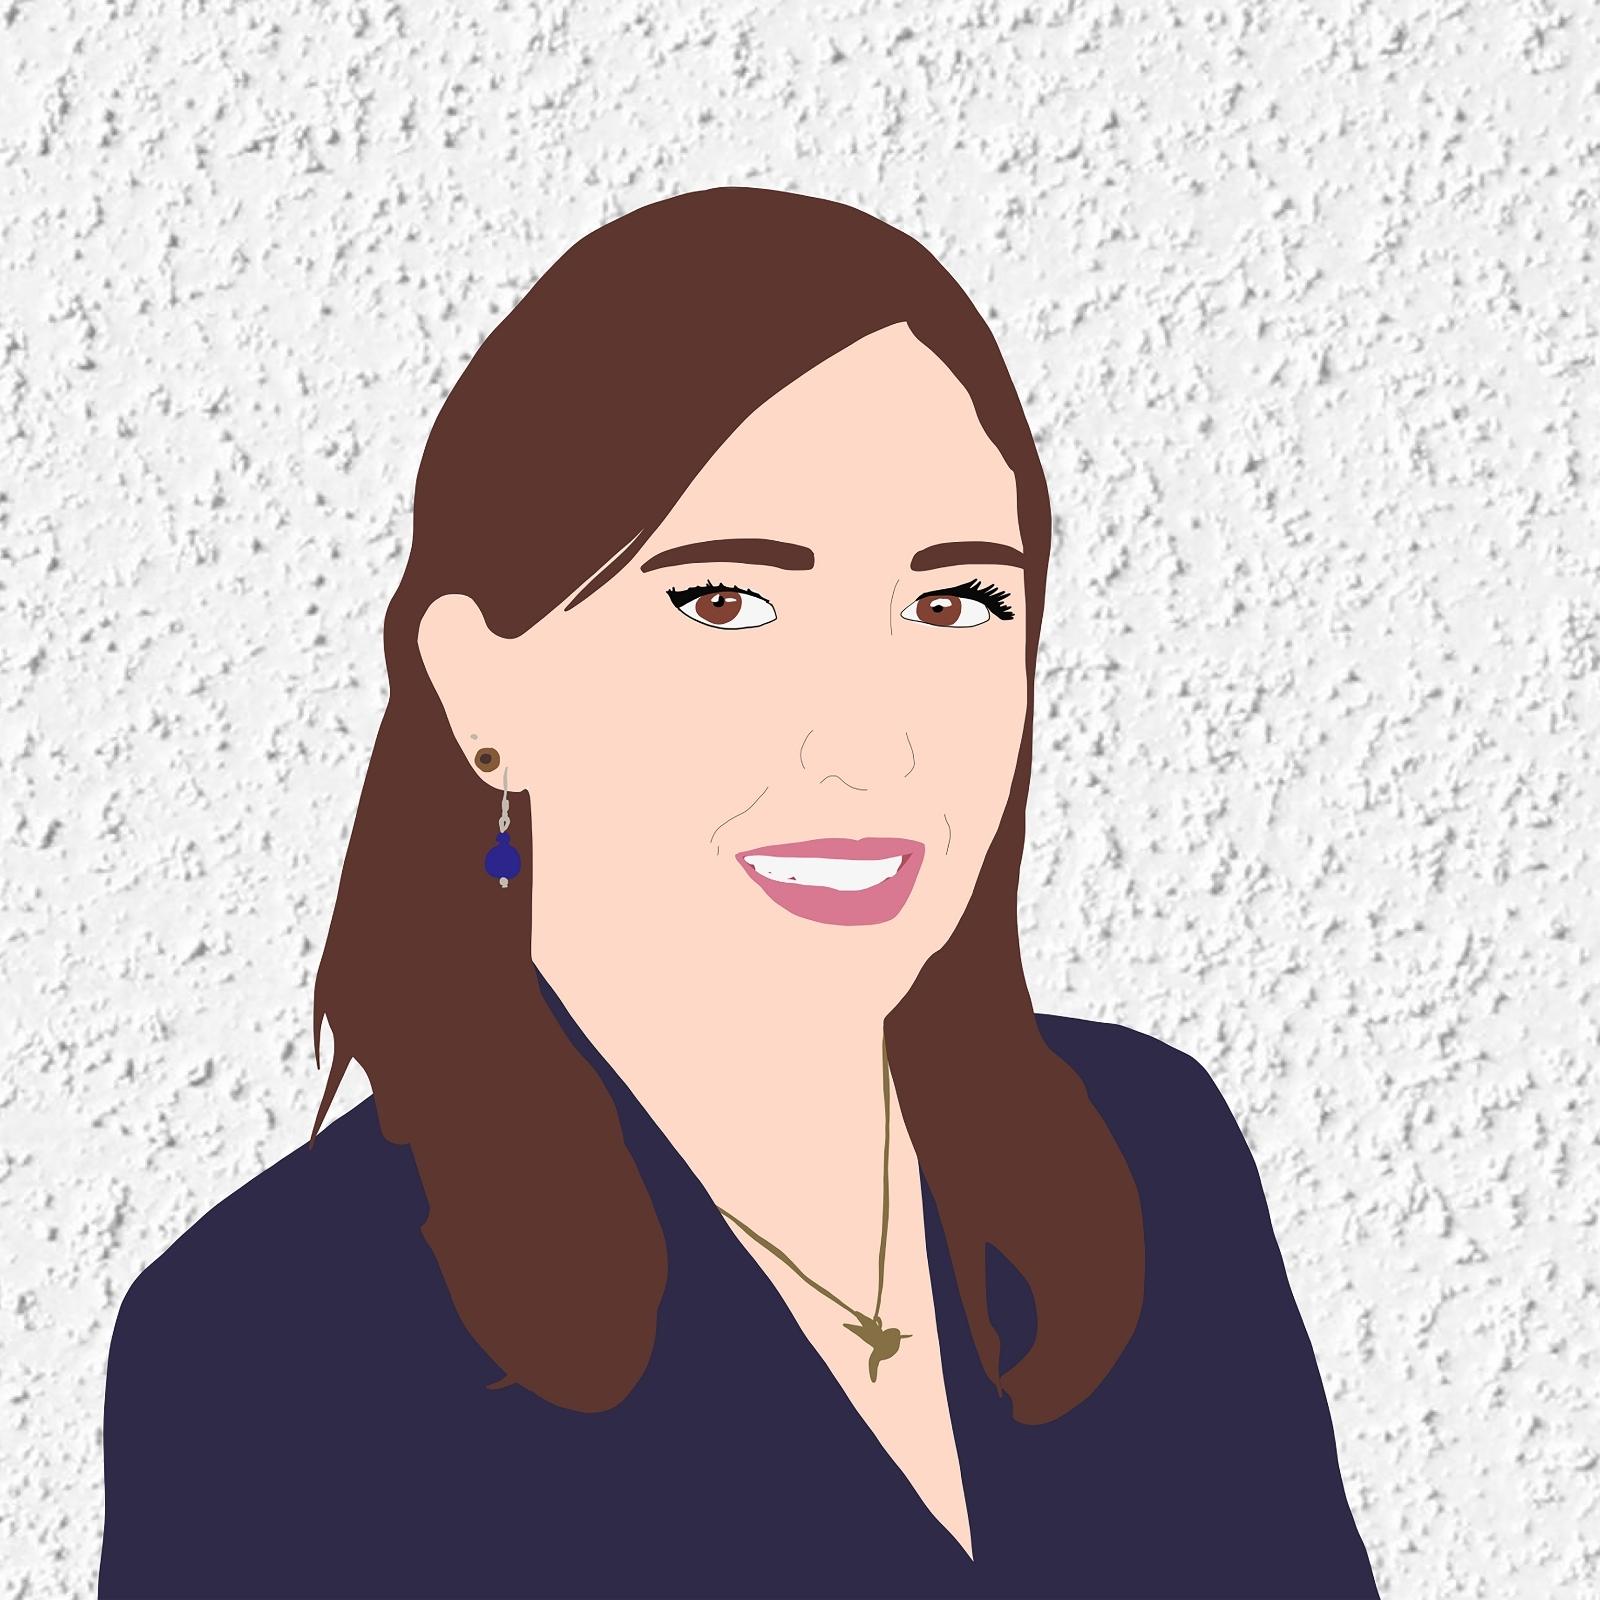 Digital illustration of Lindsay smiling against a white stucco background.